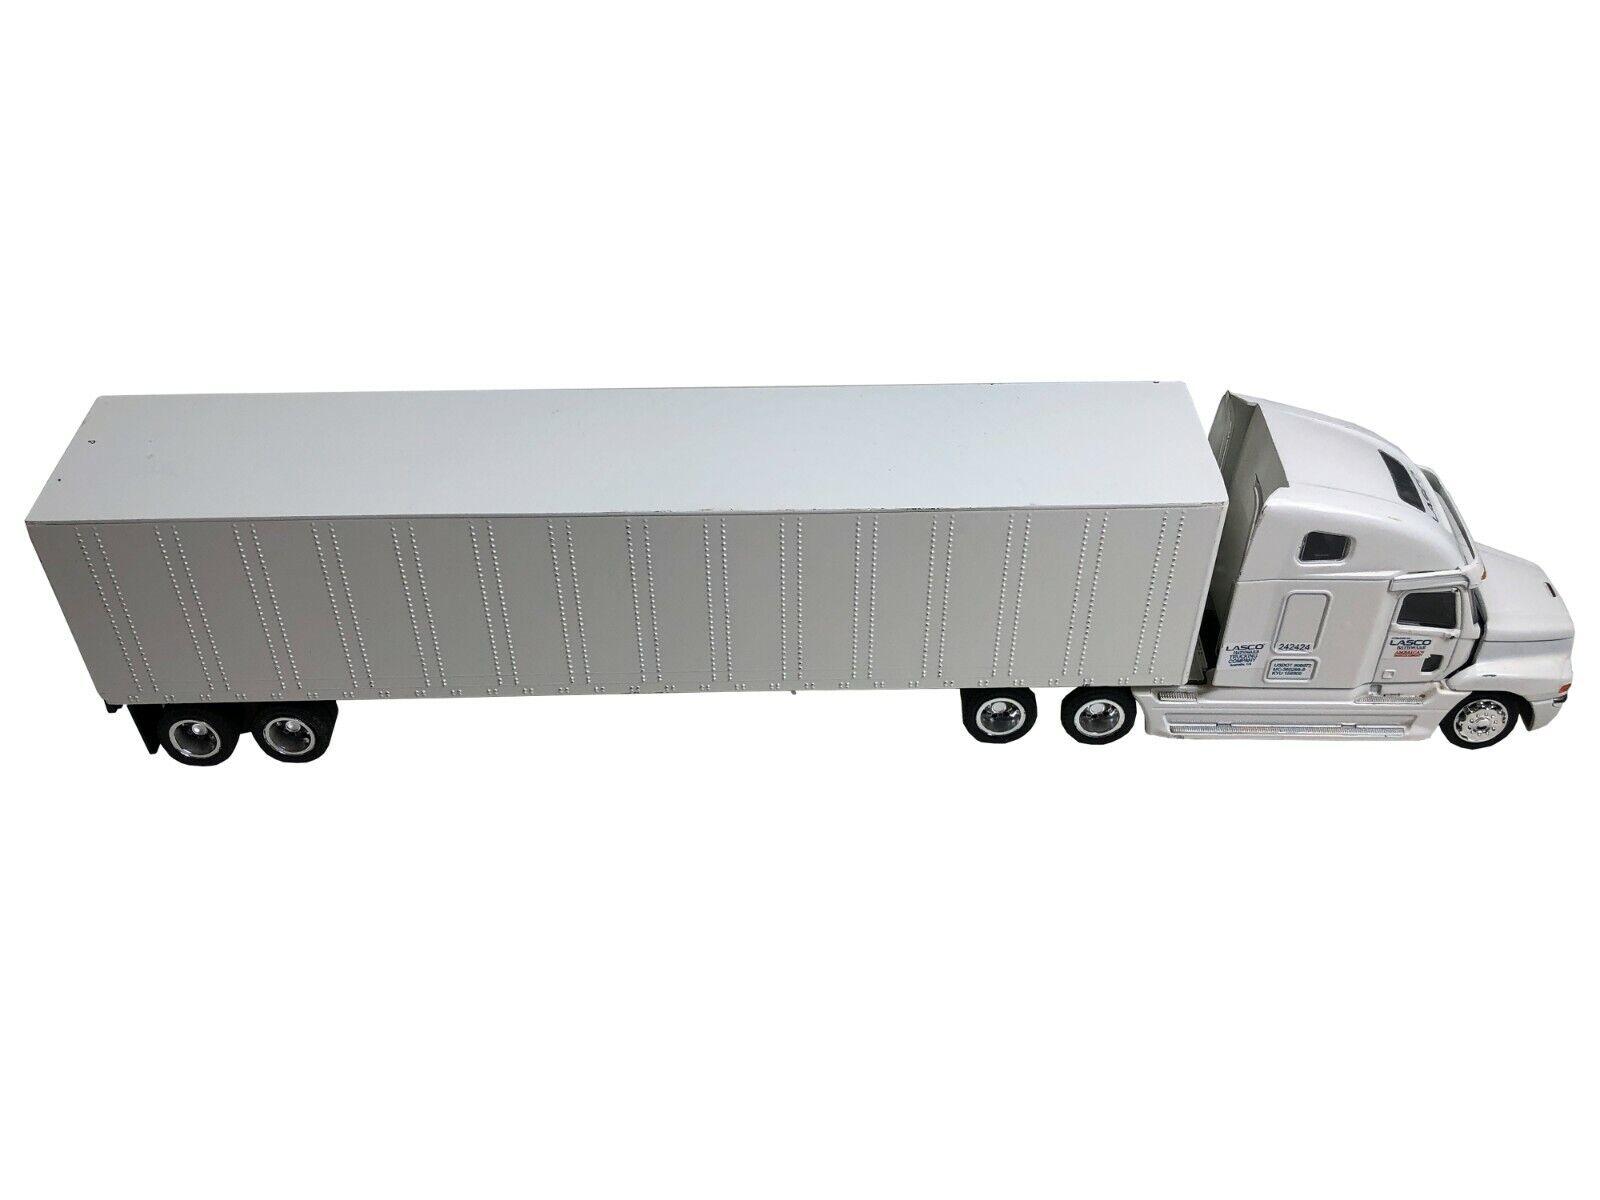 Freightliner Lasco Semi Truck NZG  416 Scale 1 43 Diecast